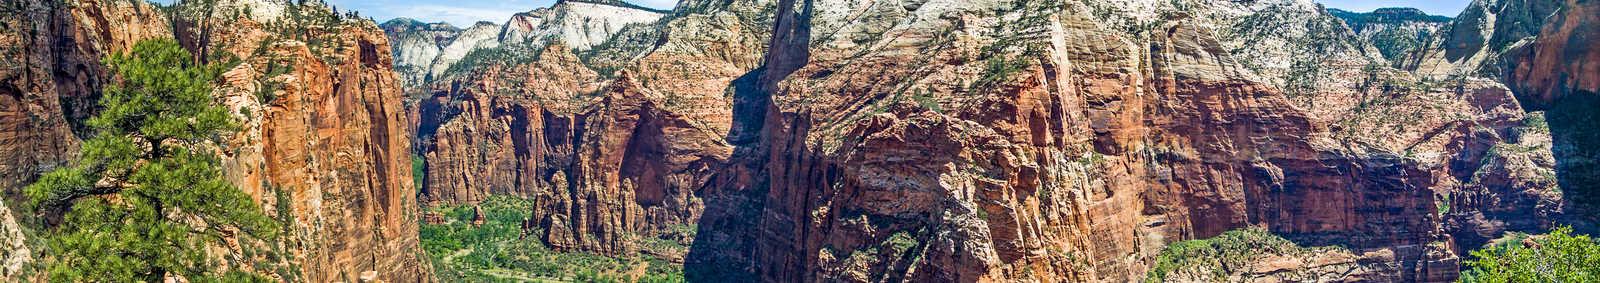 Angels Landing, Zion National Park